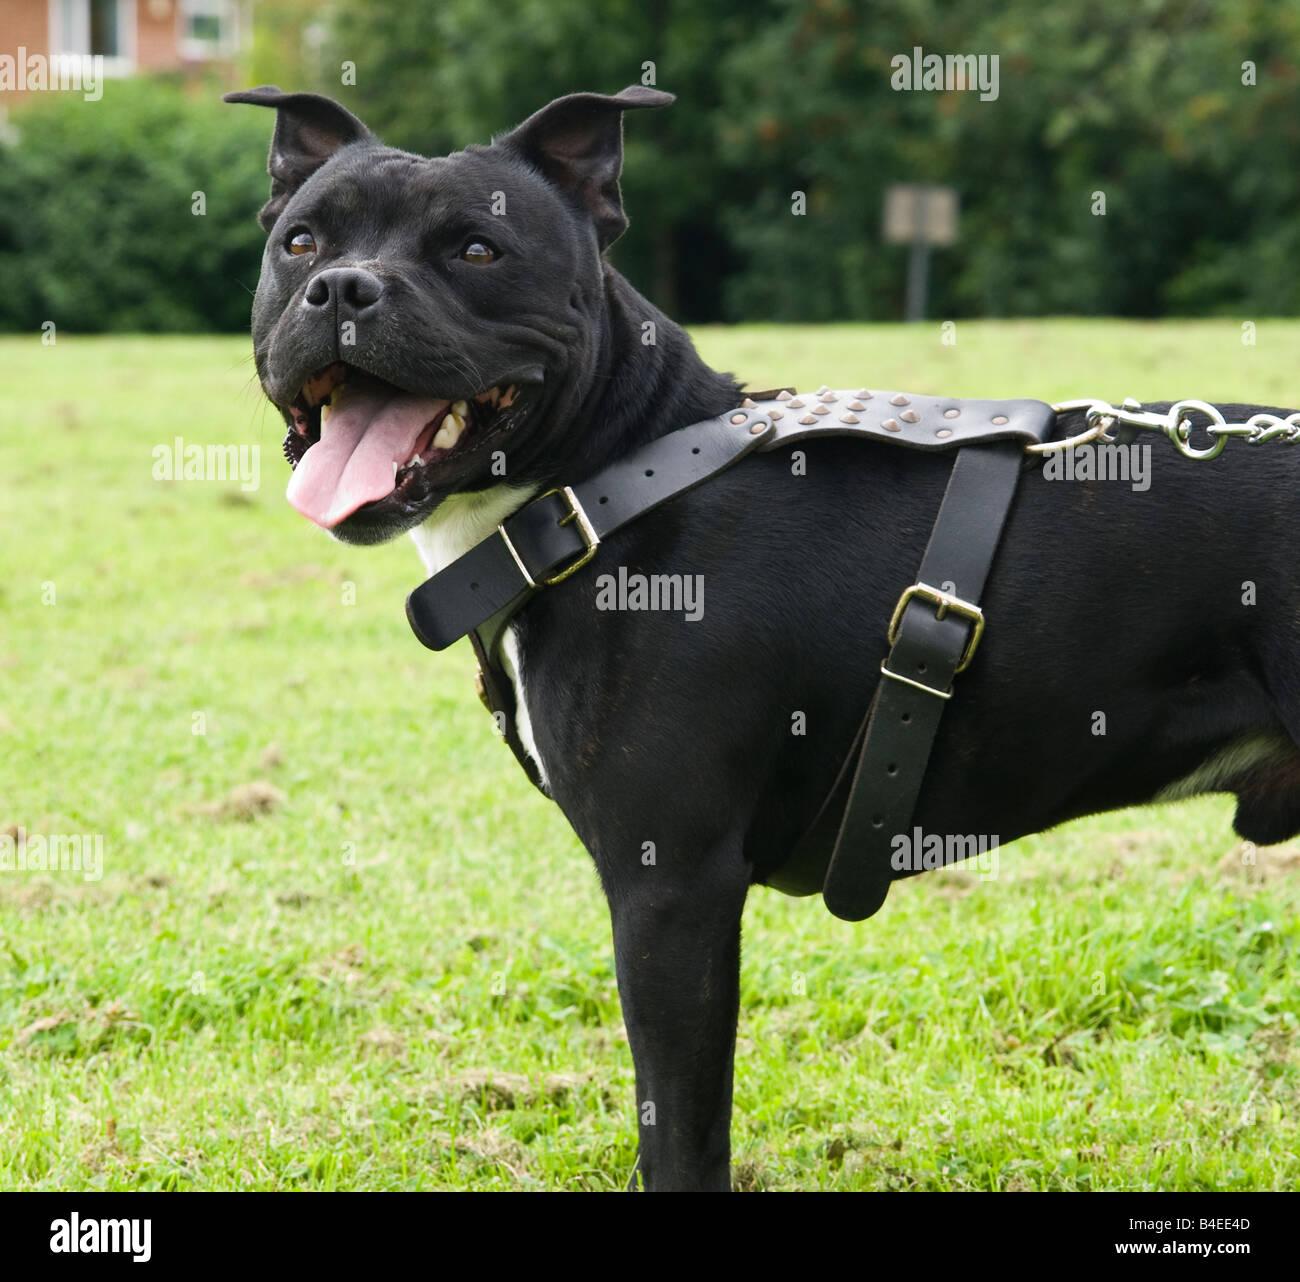 Staffordshire, Bull, Terrier, dog, staff, pitbull 3 Stock